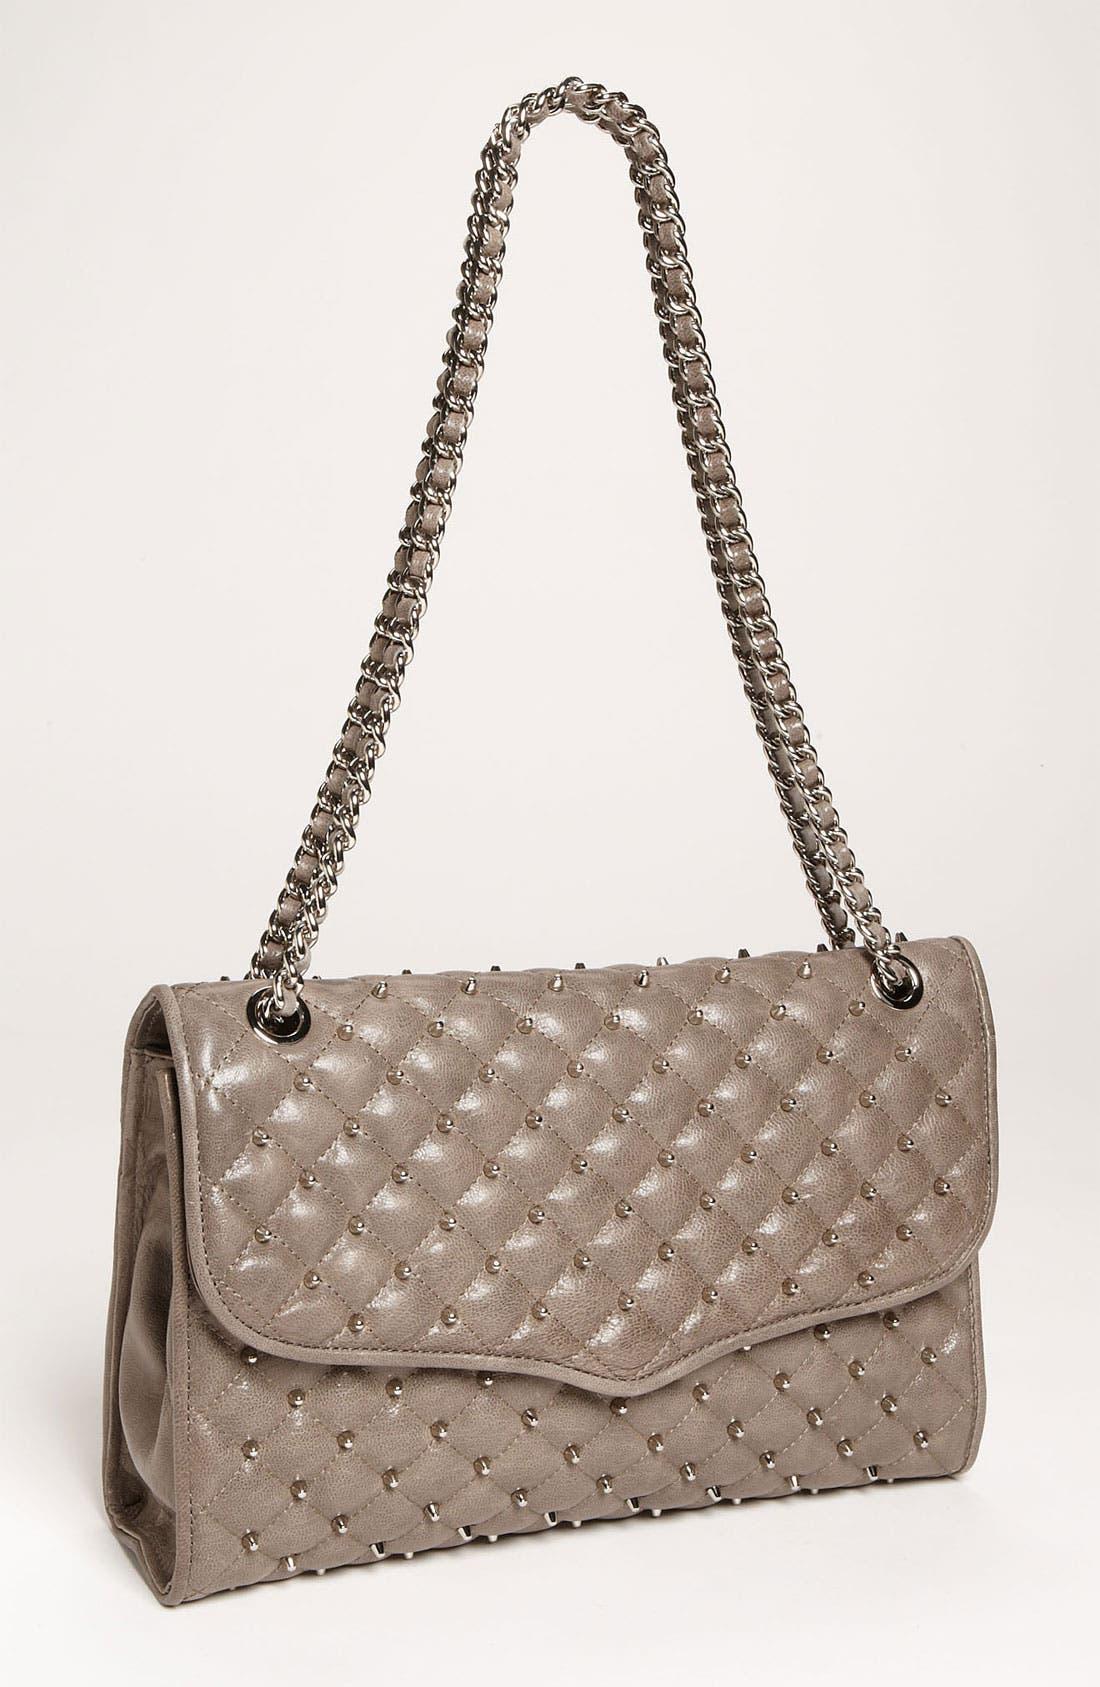 Alternate Image 1 Selected - Rebecca Minkoff 'Affair - Large' Double Chain Shoulder Bag